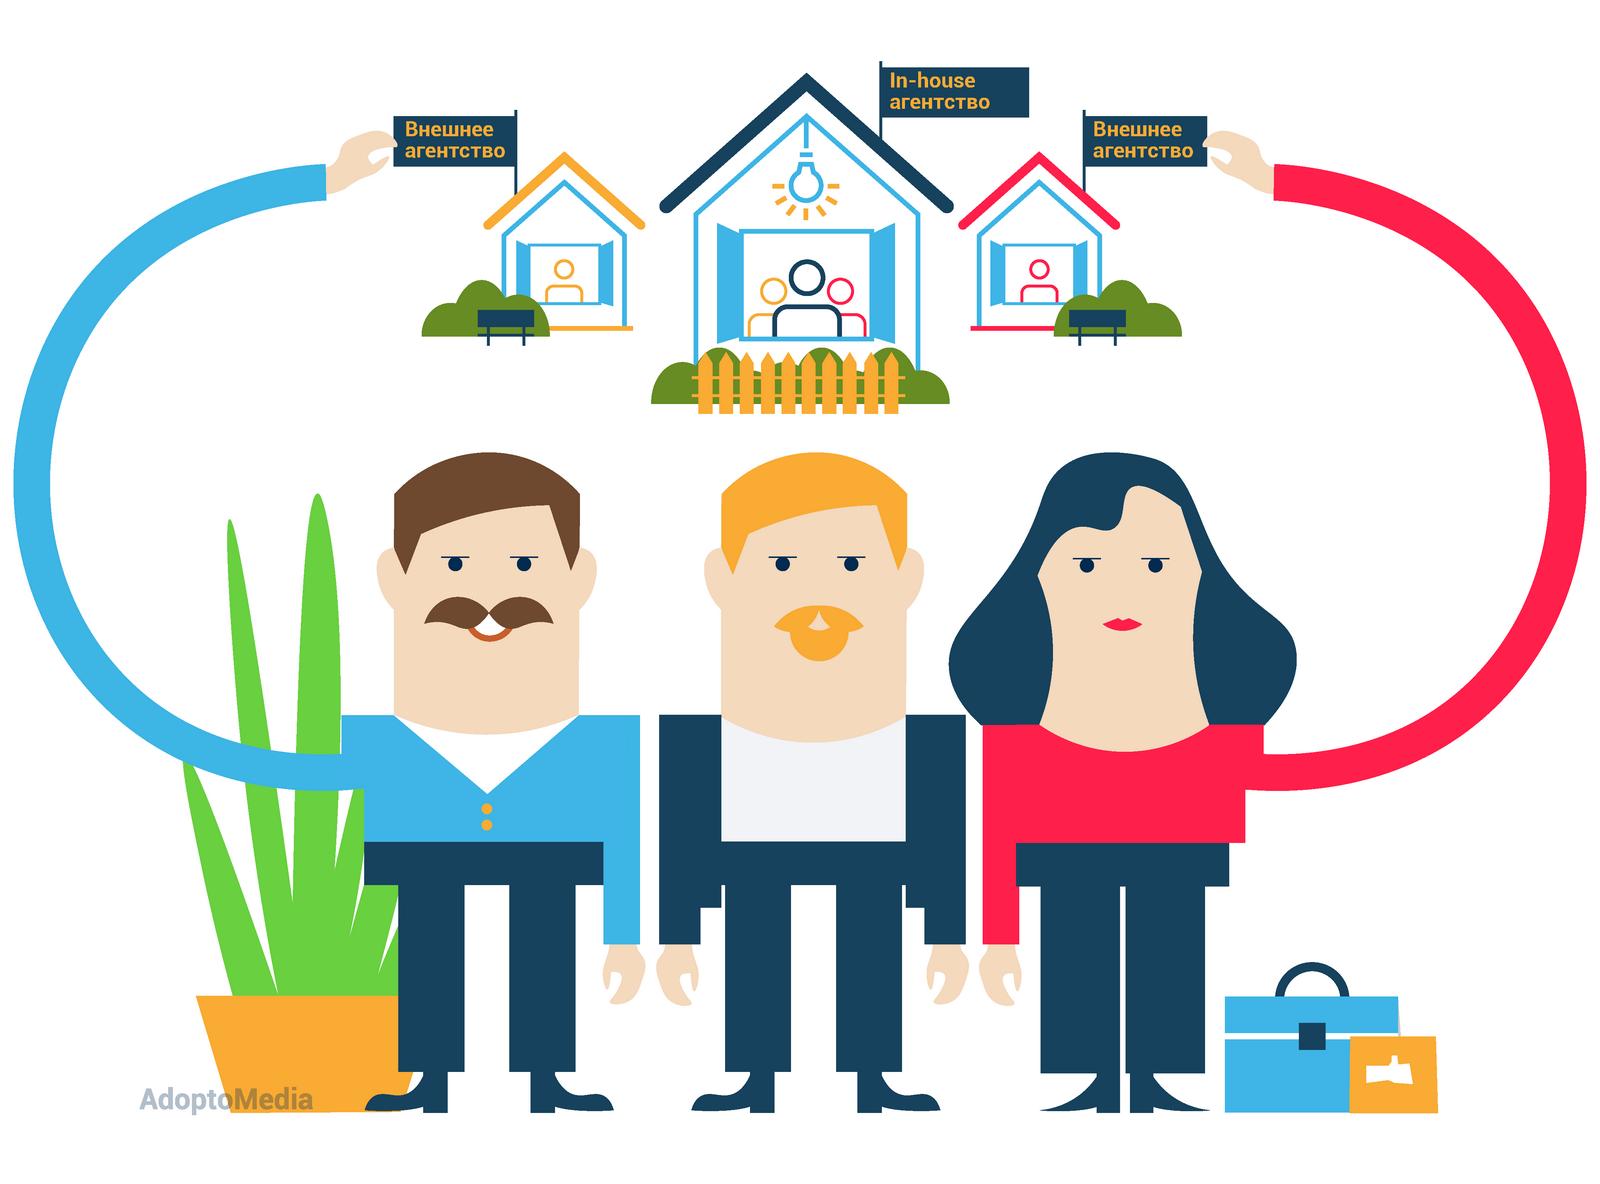 in-house агентство, инхаус-команда, преимущества и недостатки in-house агентства, эффективность маркетинга, прозрачность маркетинга, CheckMedia Solution, AdoptoMedia